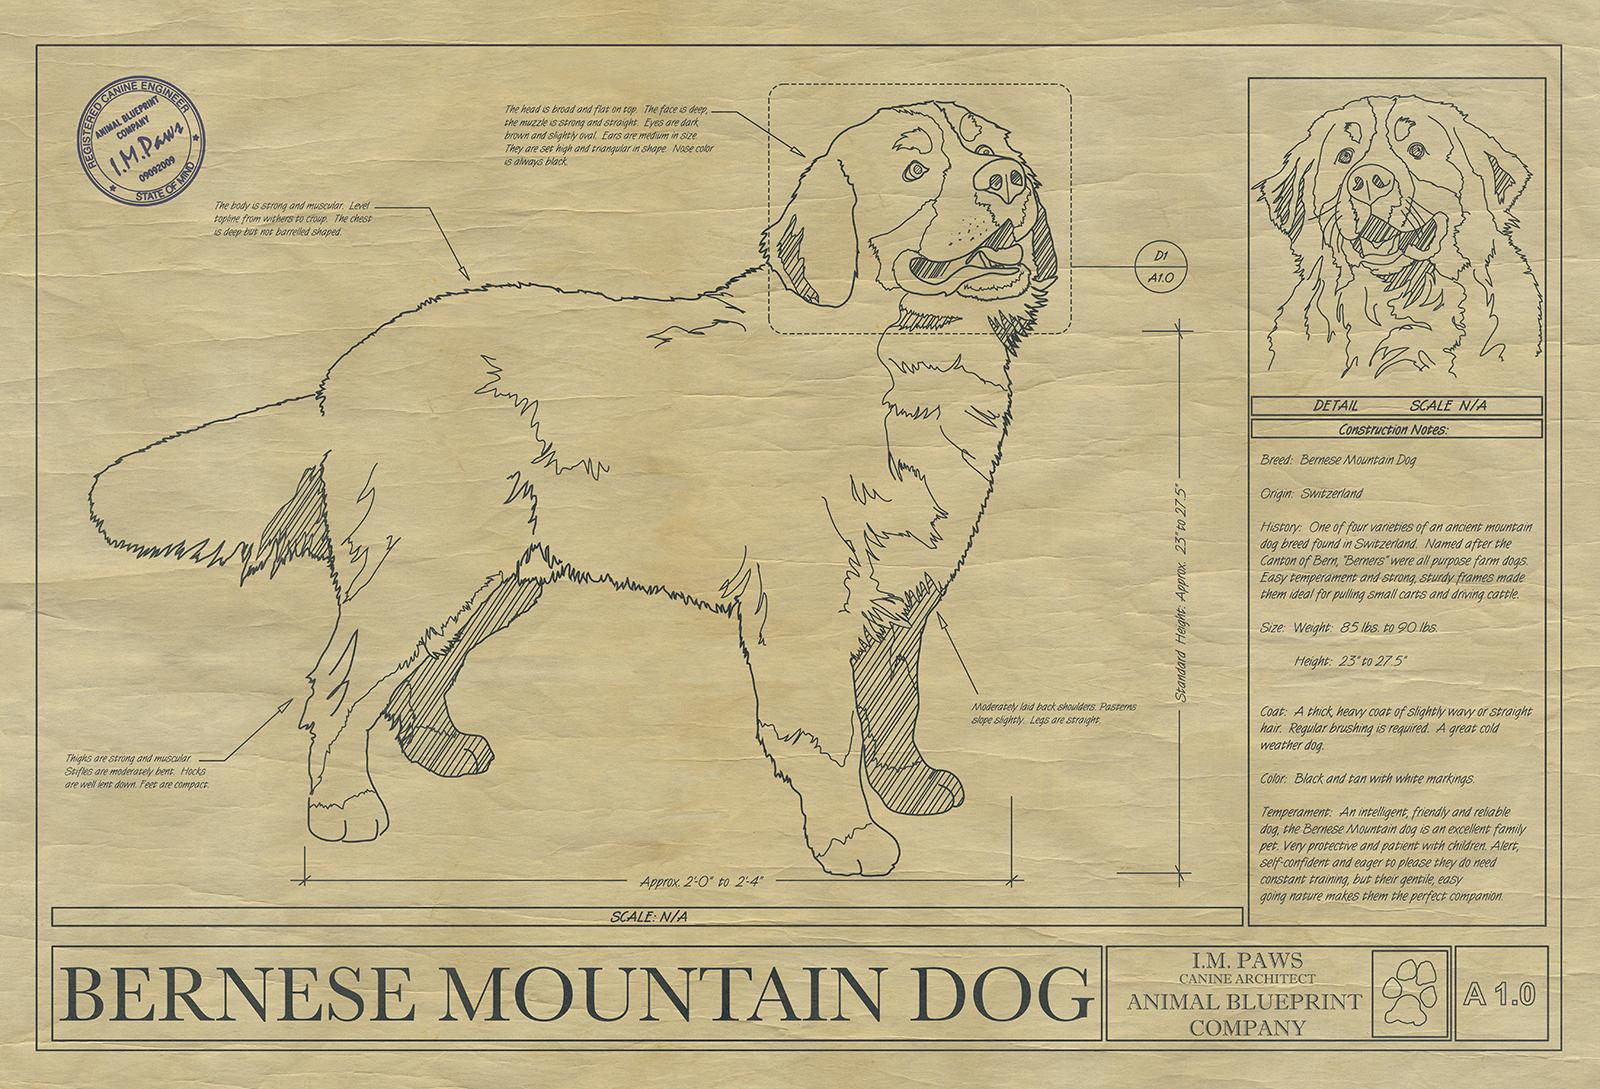 Bernese mountain dog drawing animal blueprint company click malvernweather Images